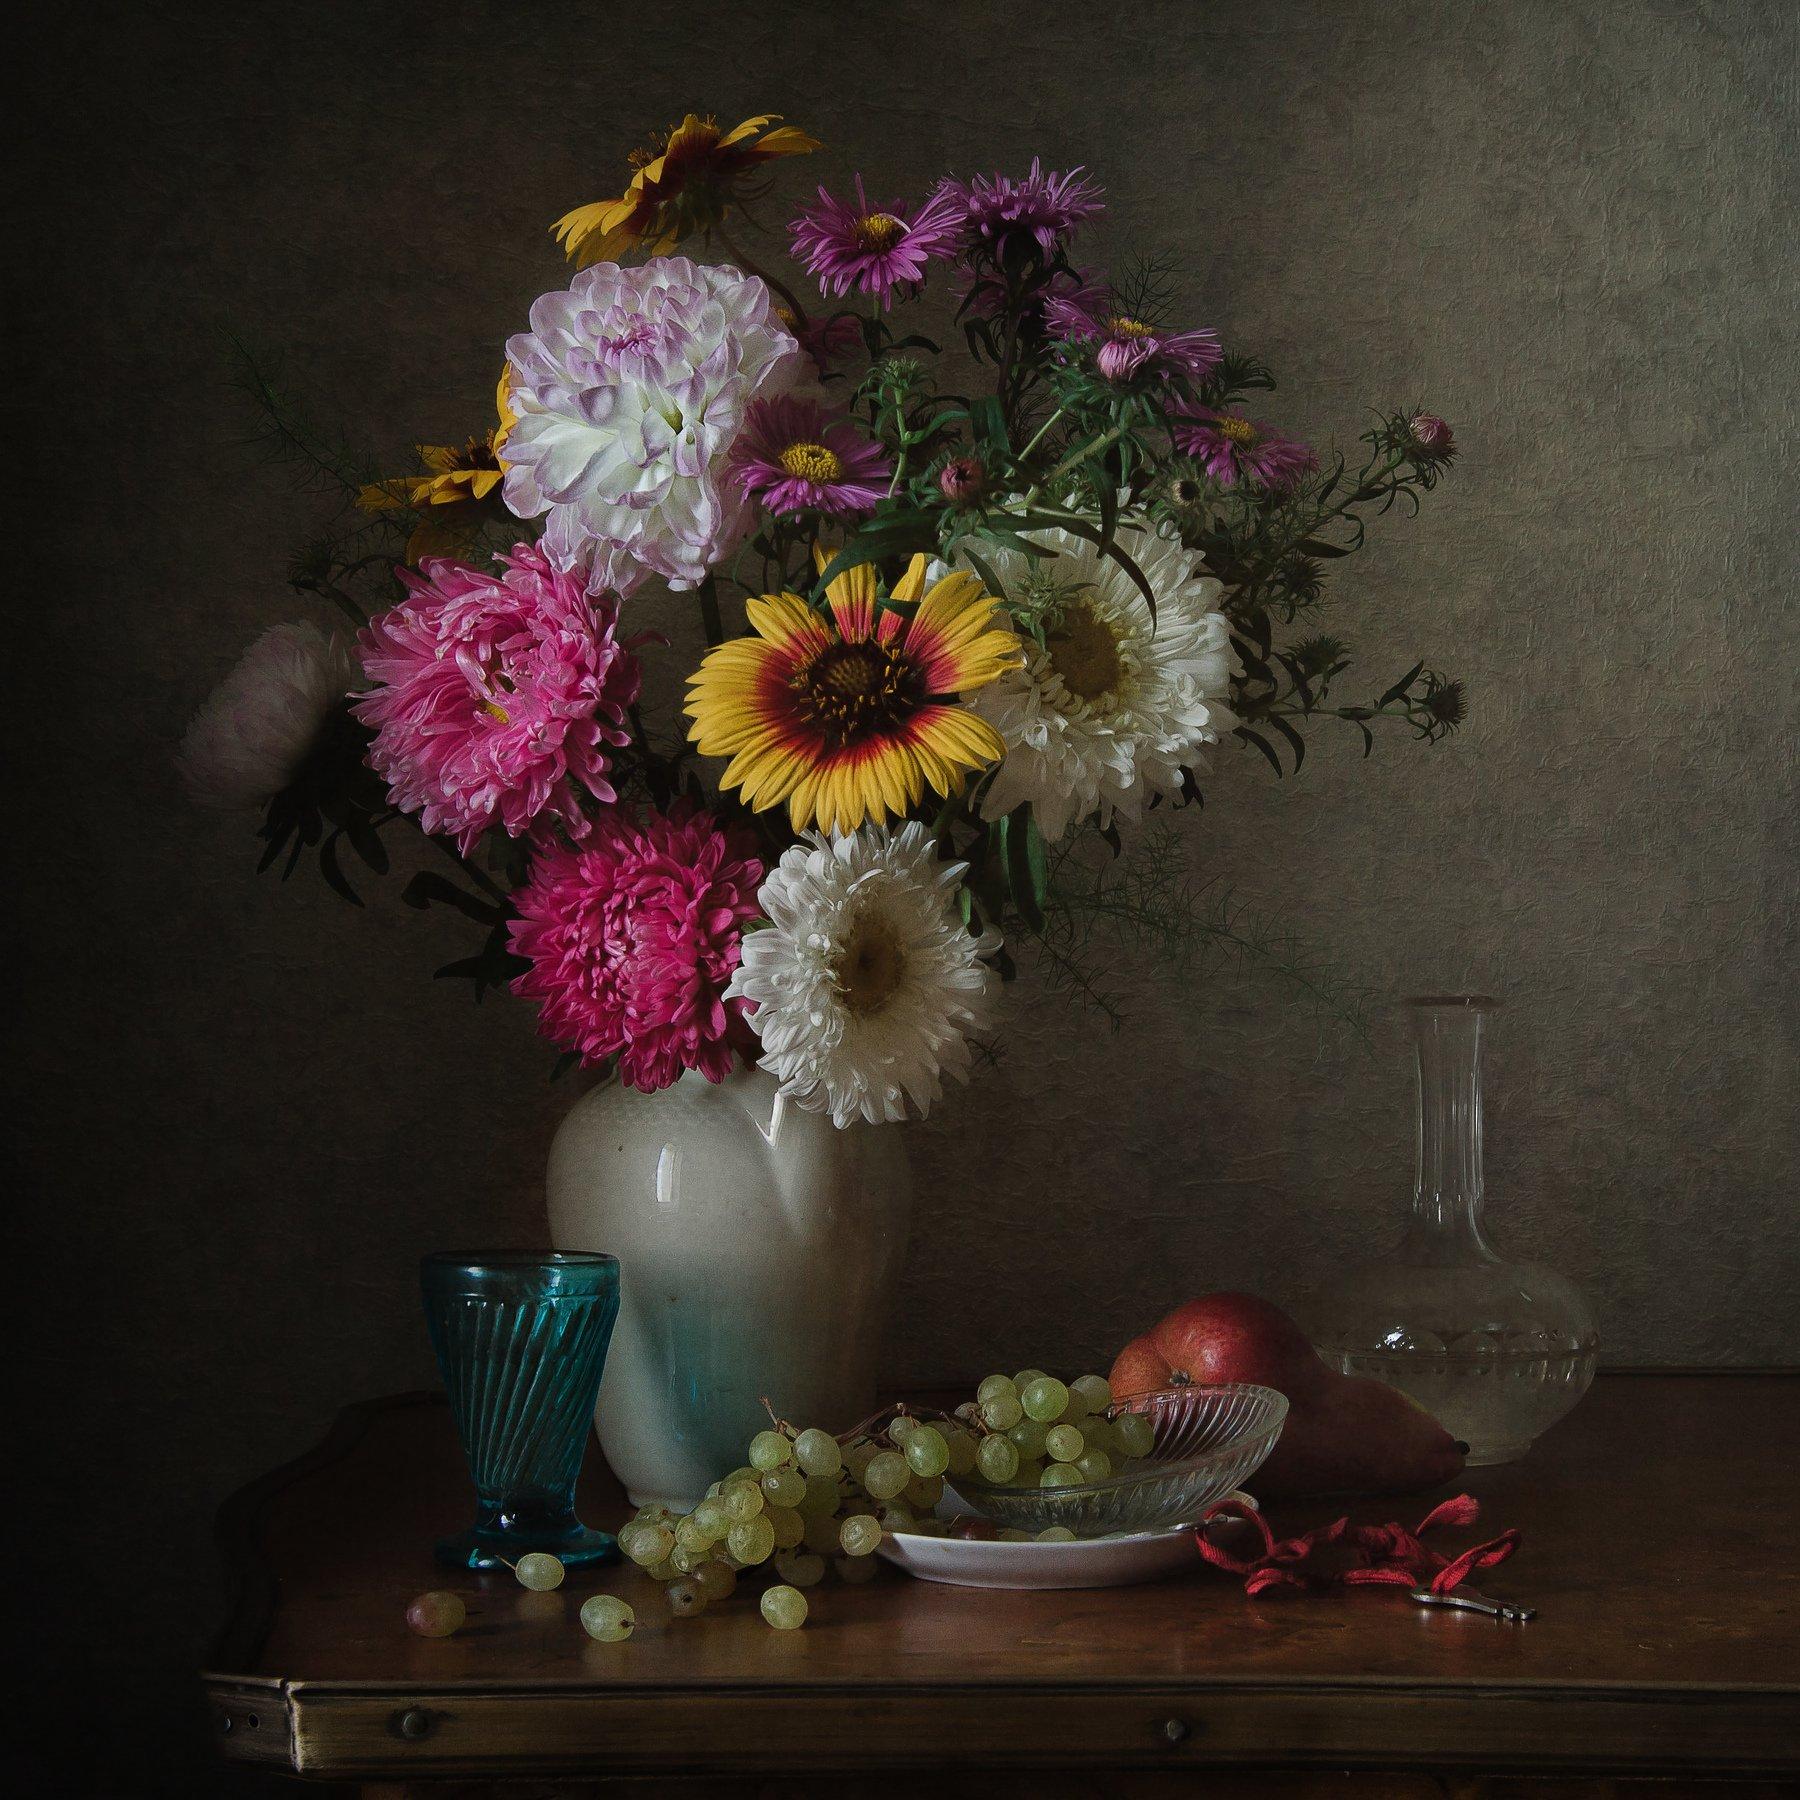 натюрморт, фарфор, стекло, цветы, виноград, груша, Анна Петина